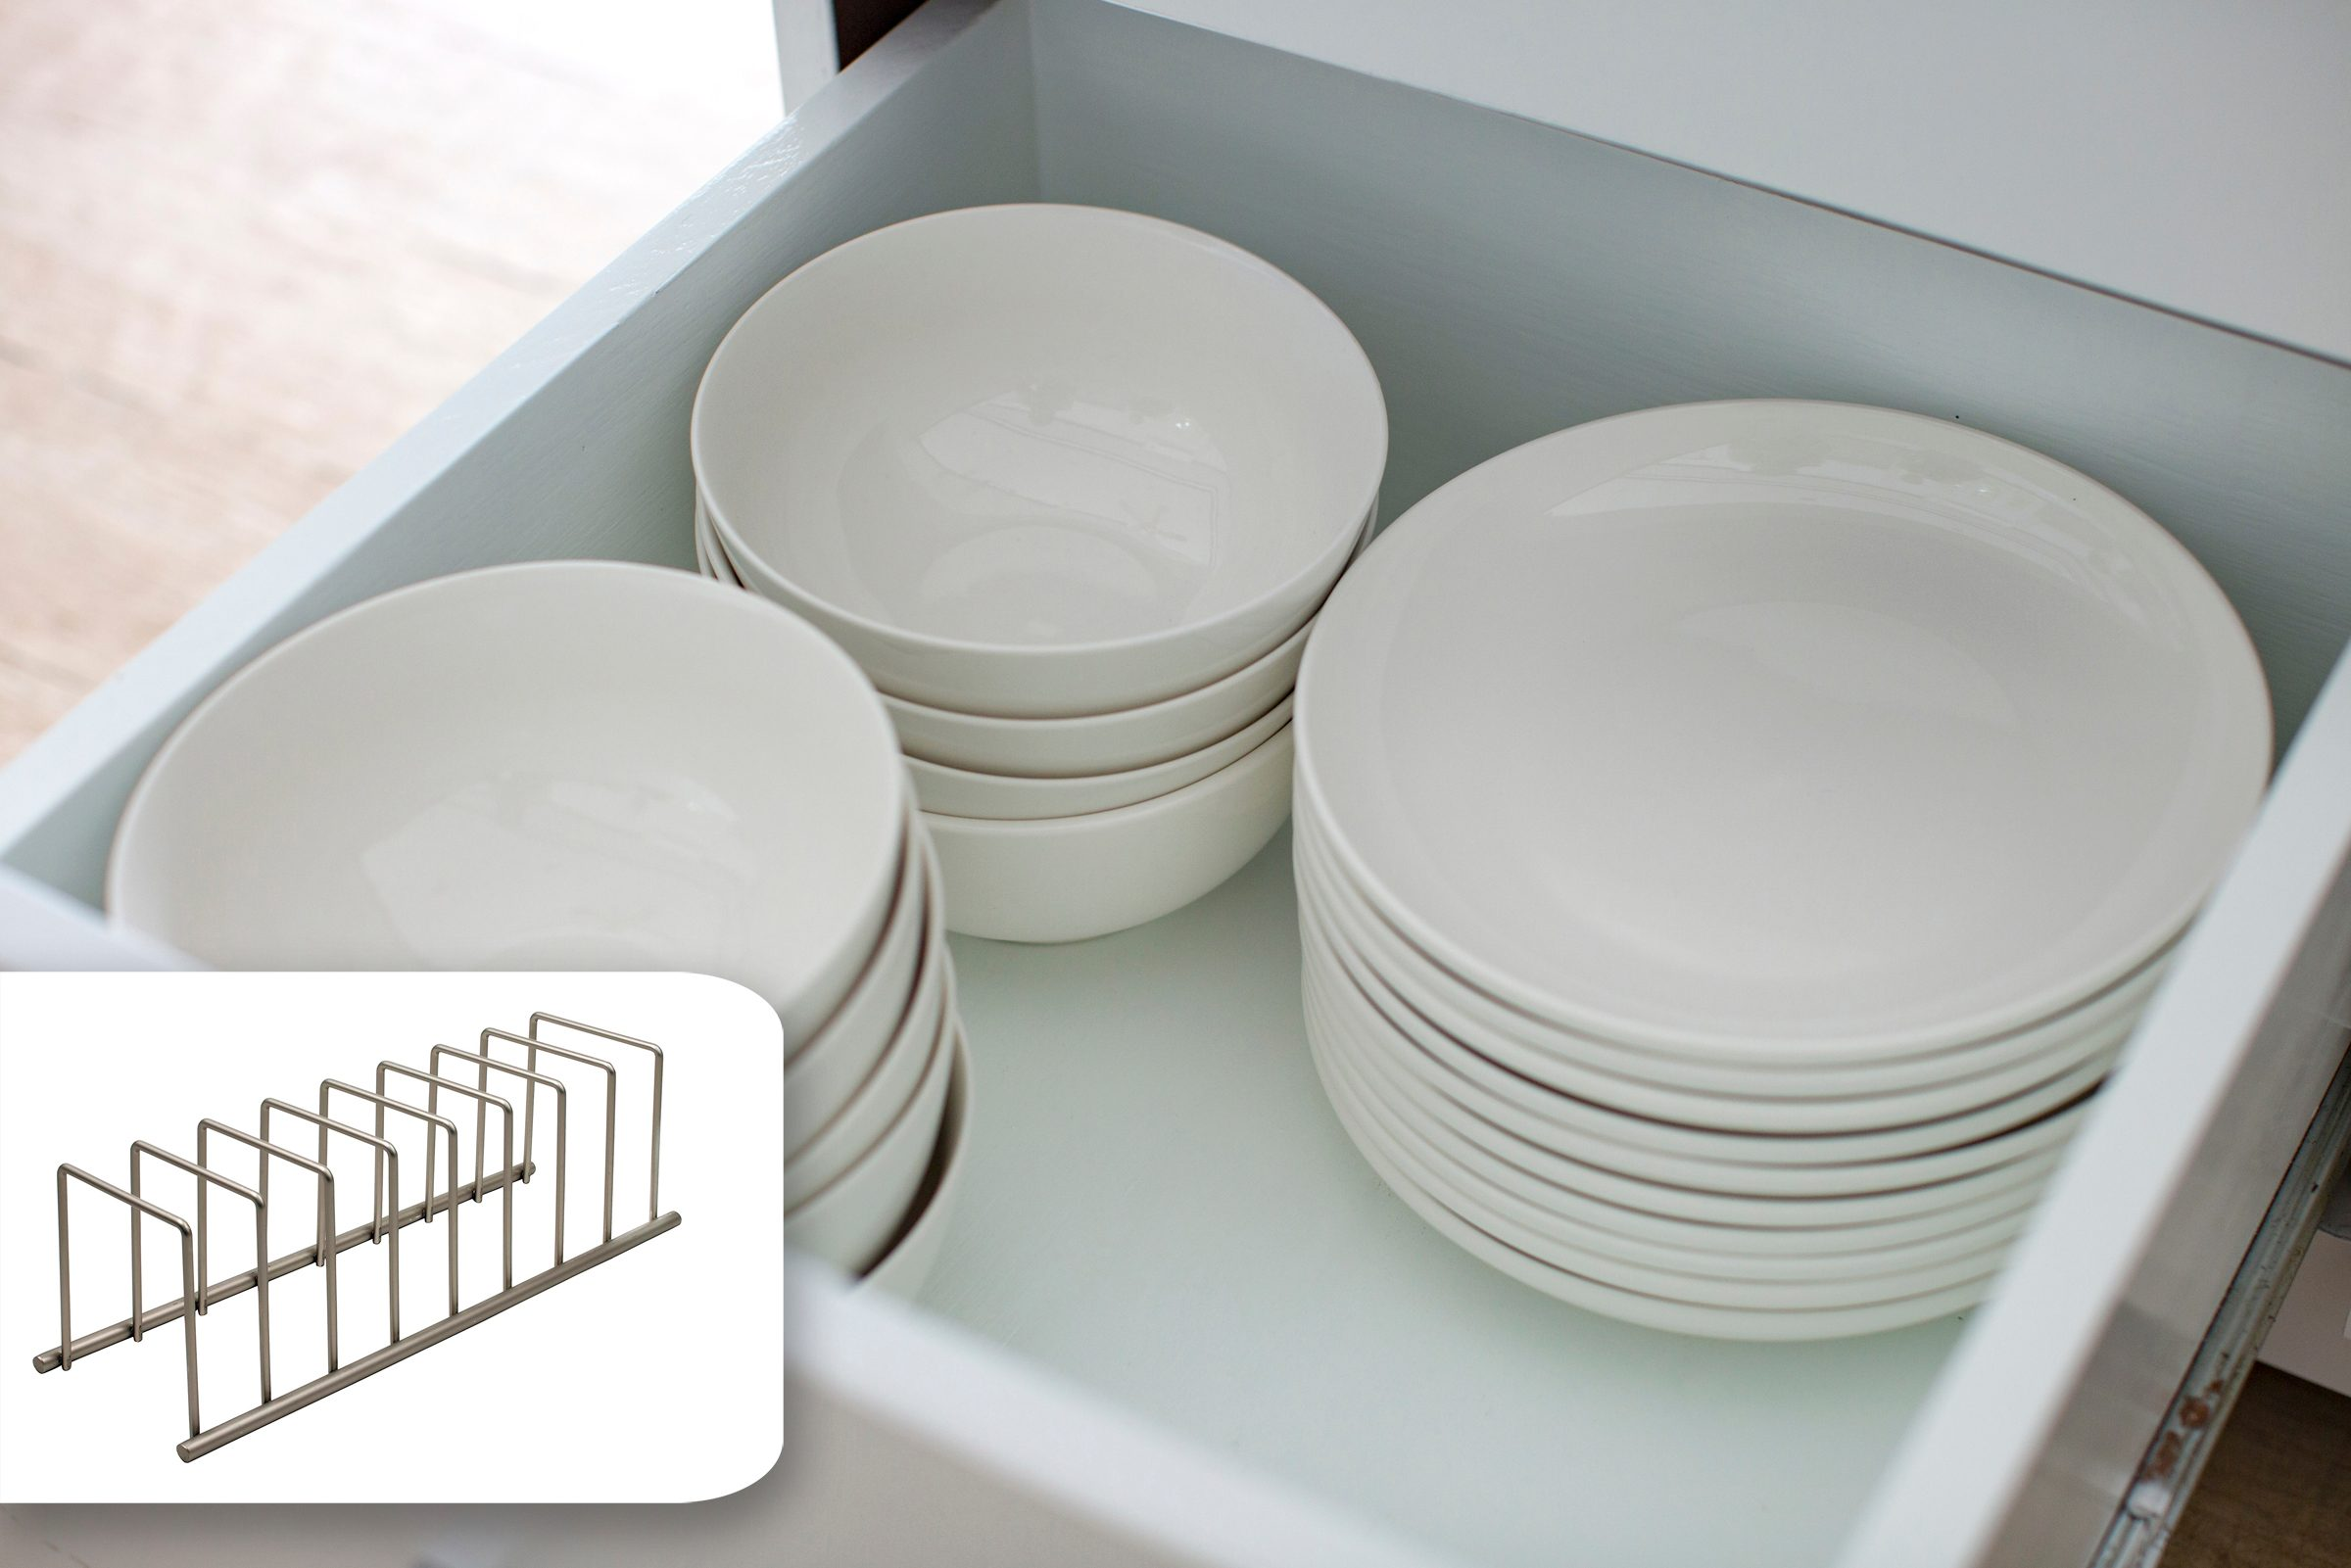 organization dish washer dishes drawer storage amazon